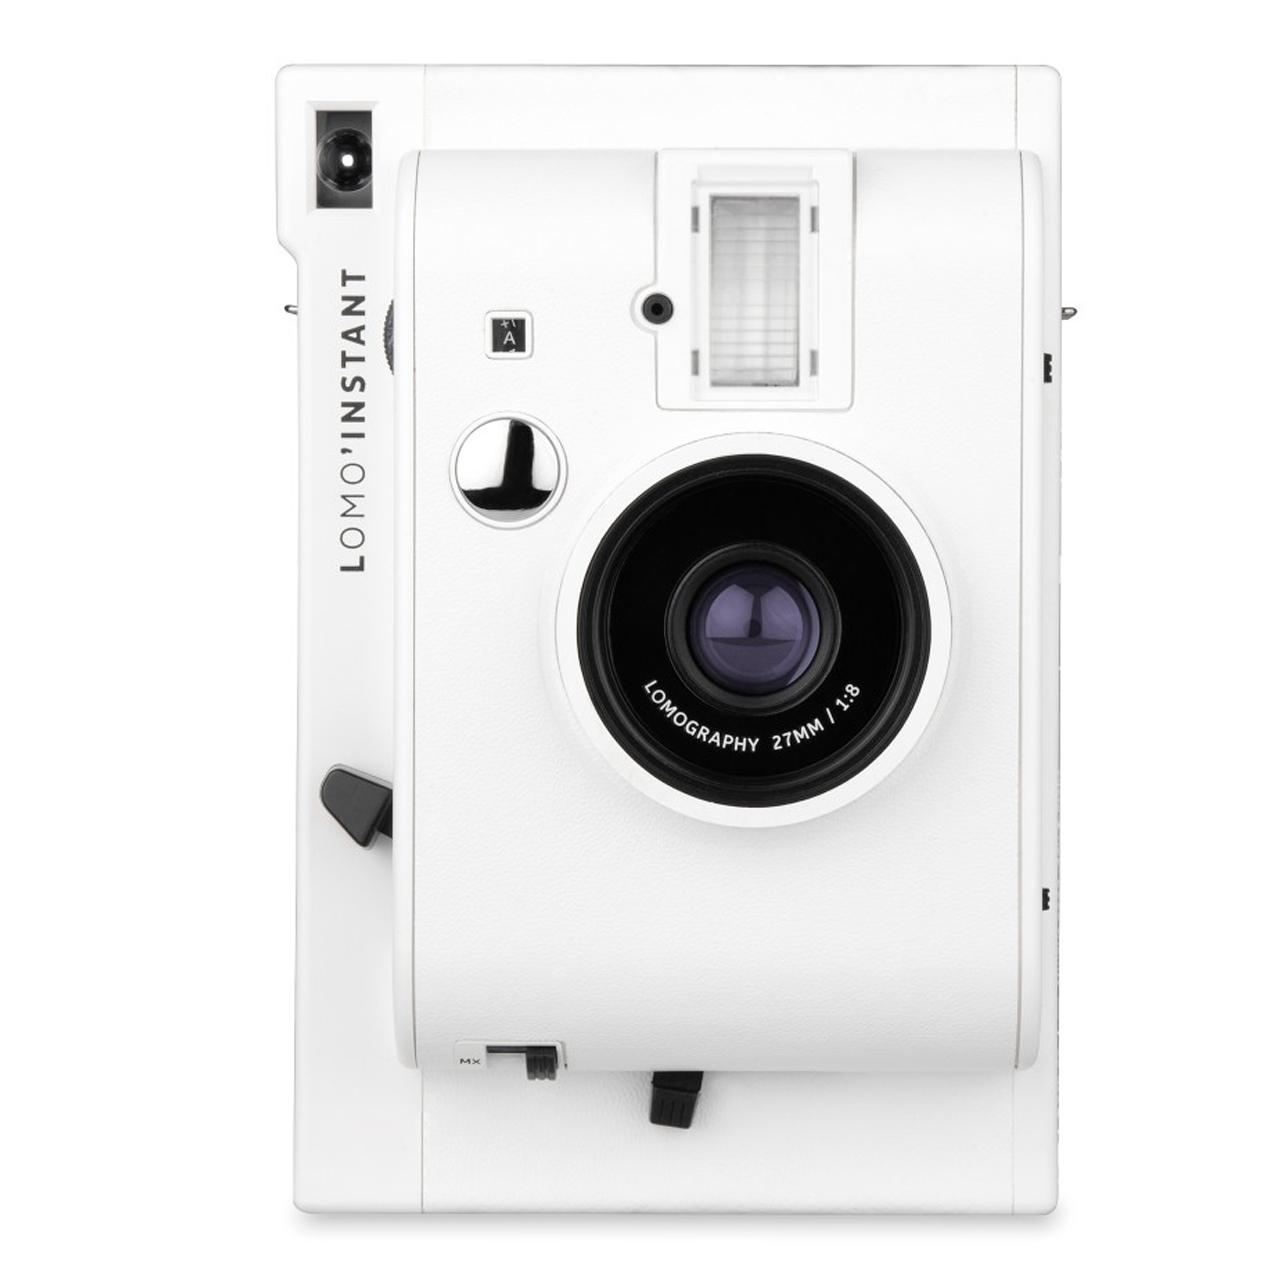 فروش نقدی و اقساطی دوربین چاپ سریع لوموگرافی مدل White